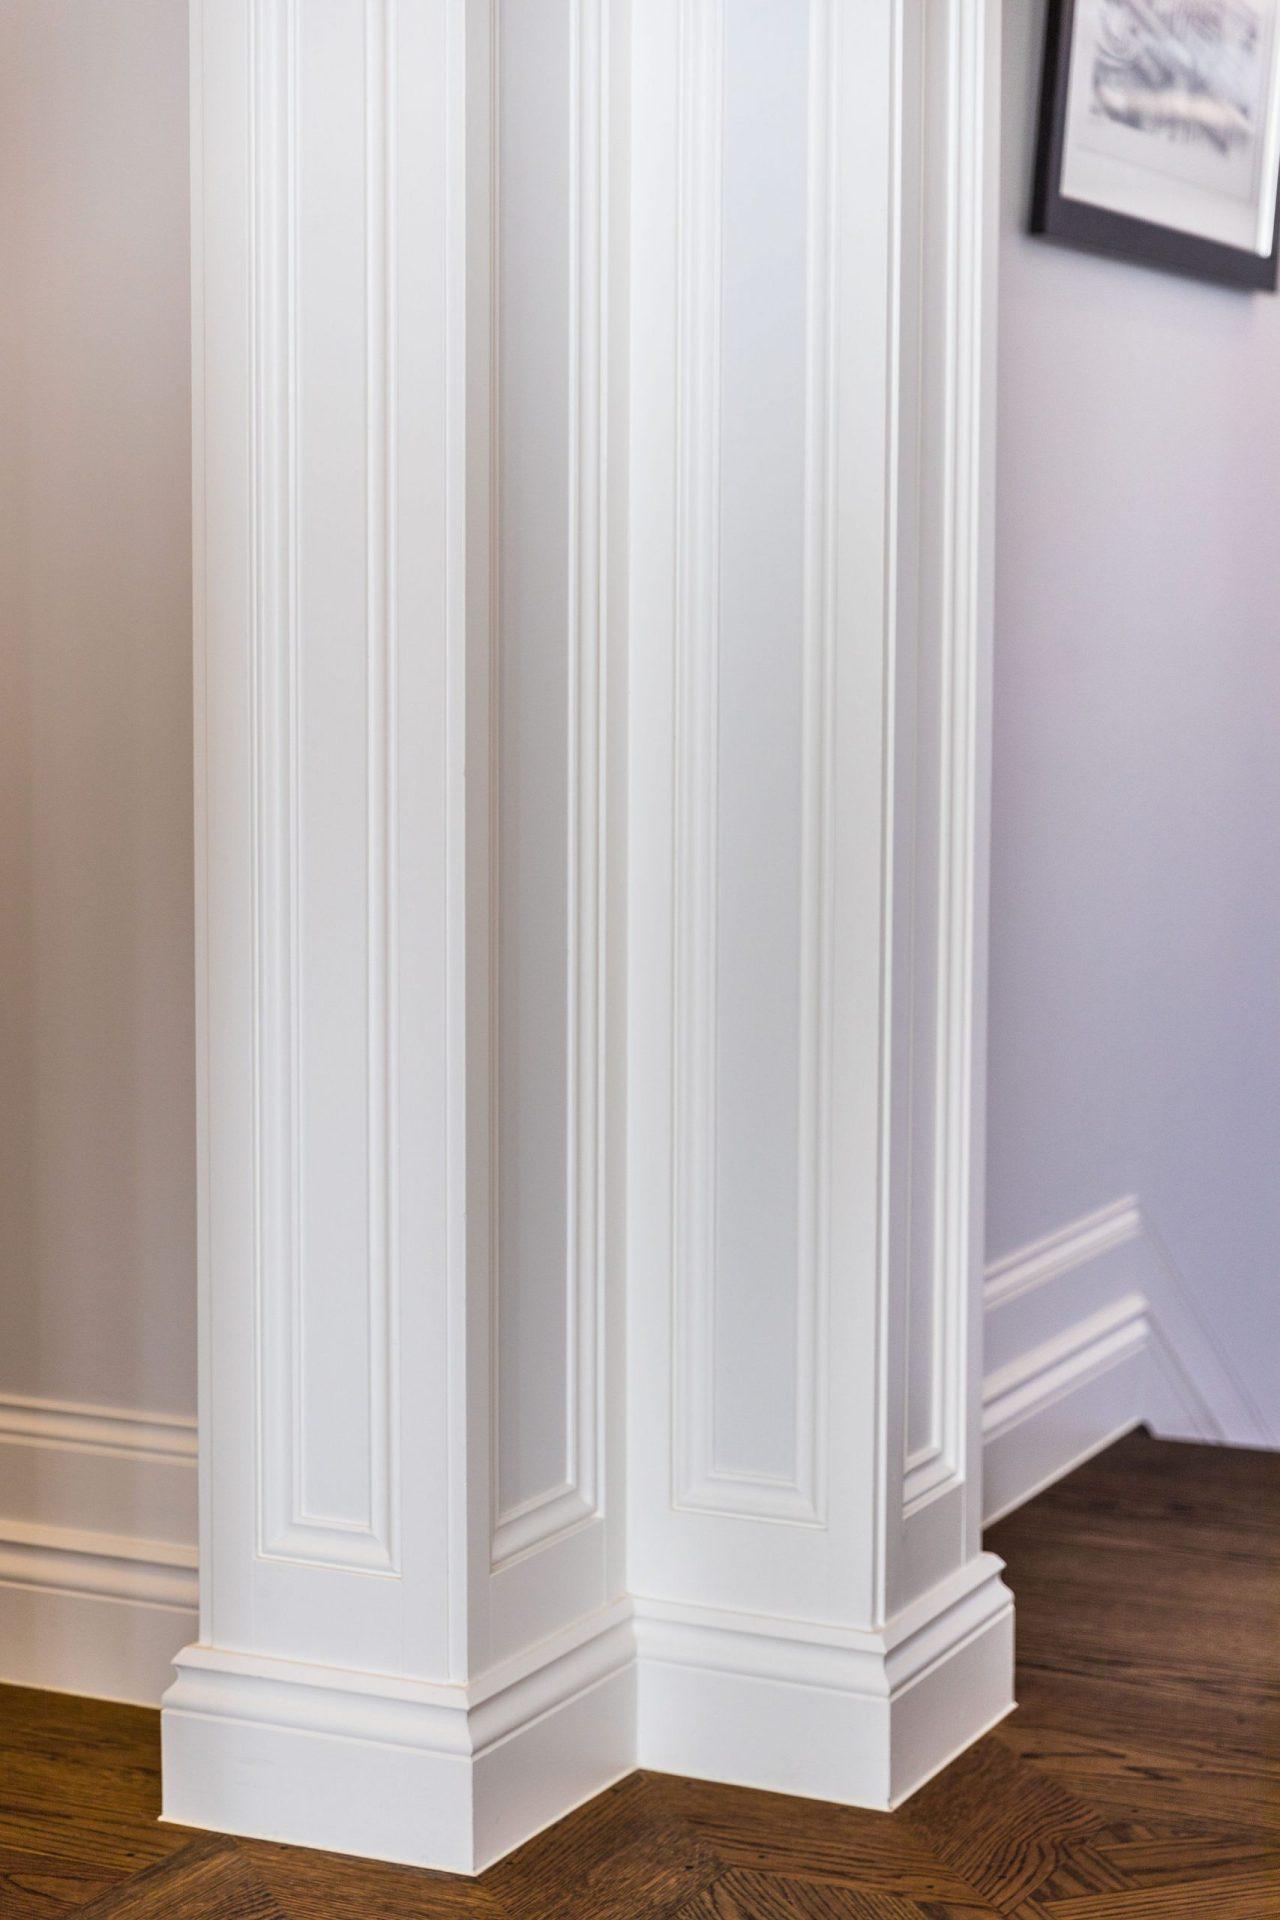 White wooden walls